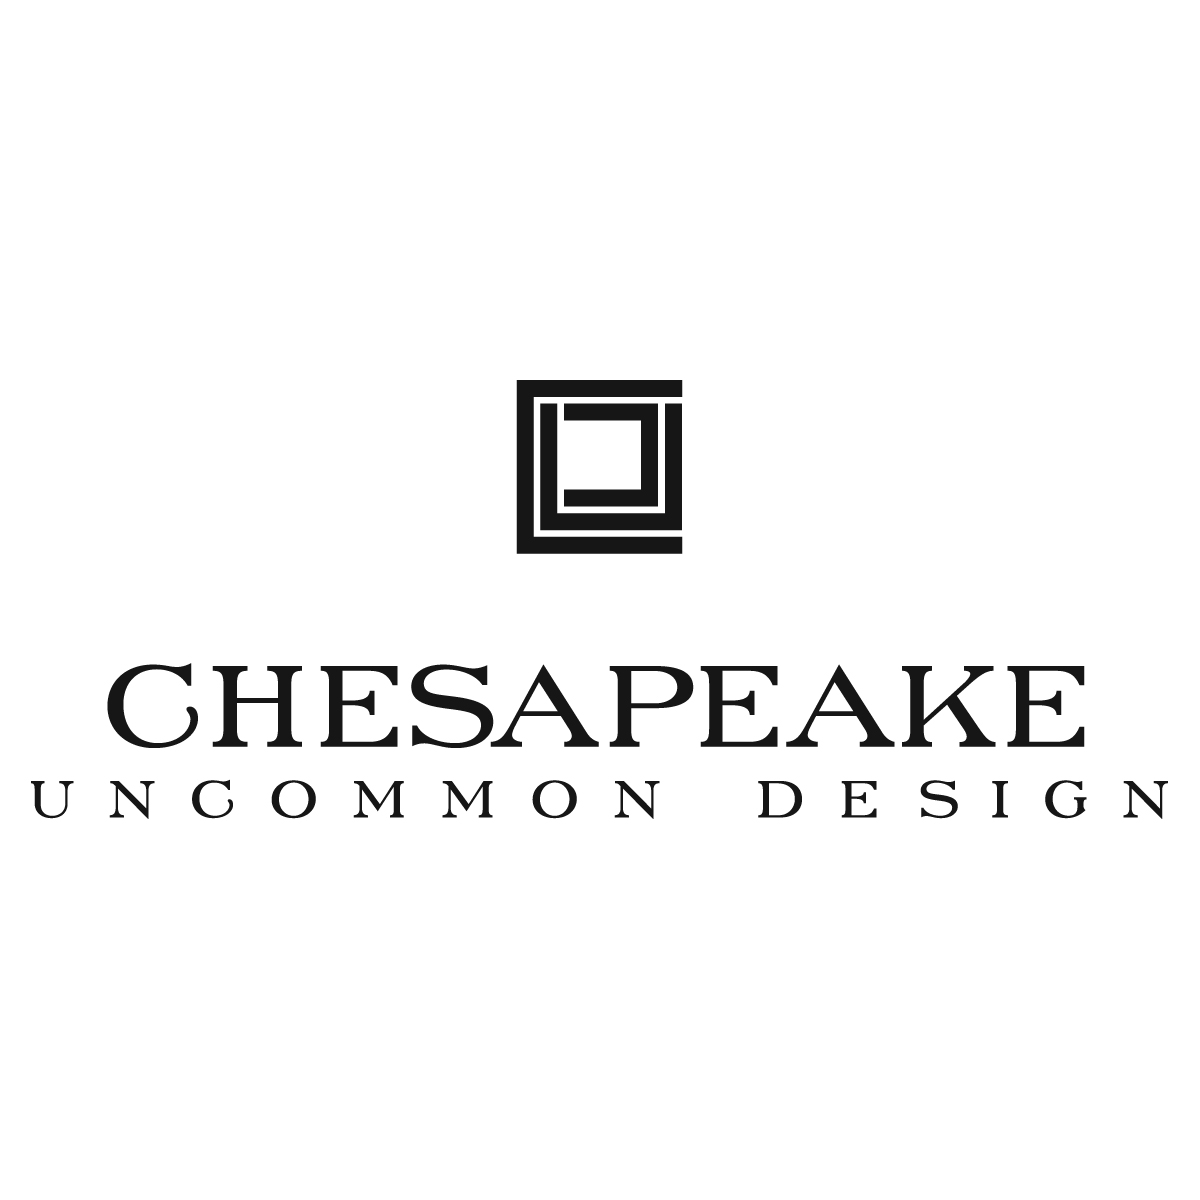 Chesapeake Uncommon Design (Architect)